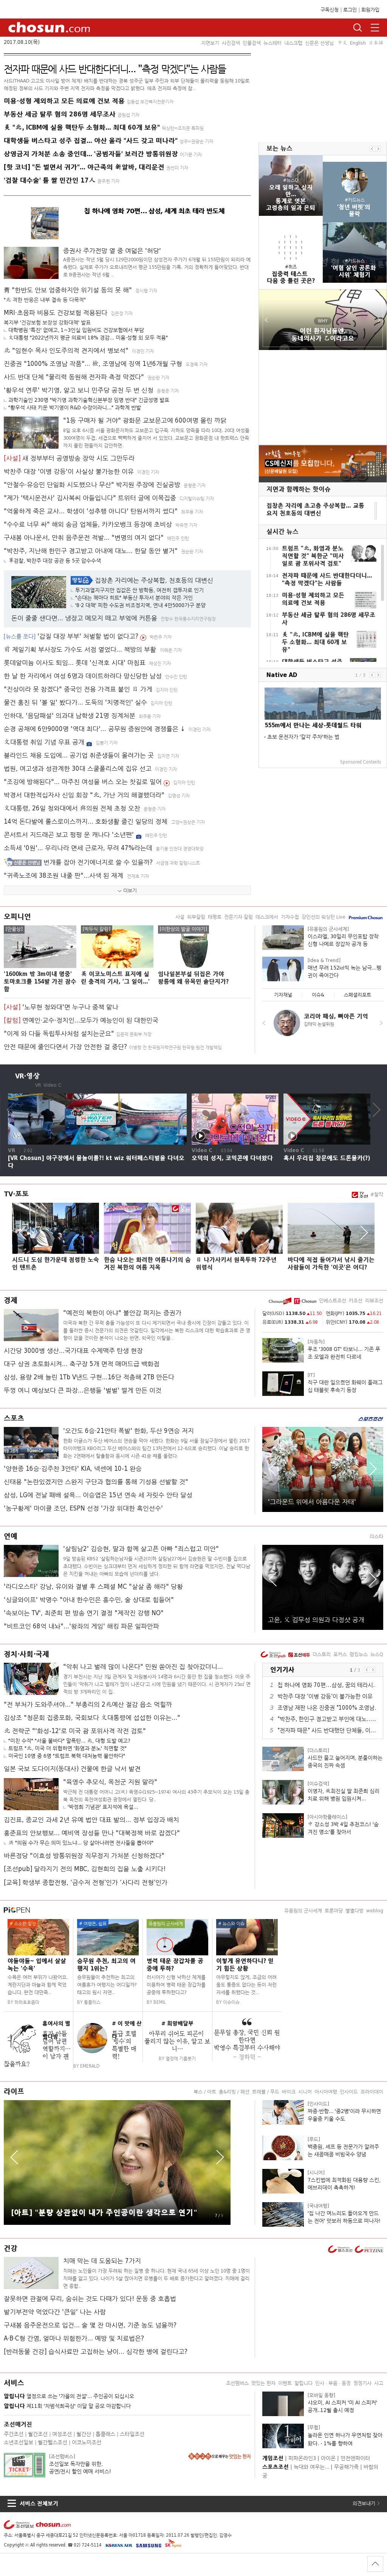 chosun.com at Wednesday Aug. 9, 2017, 7:03 p.m. UTC